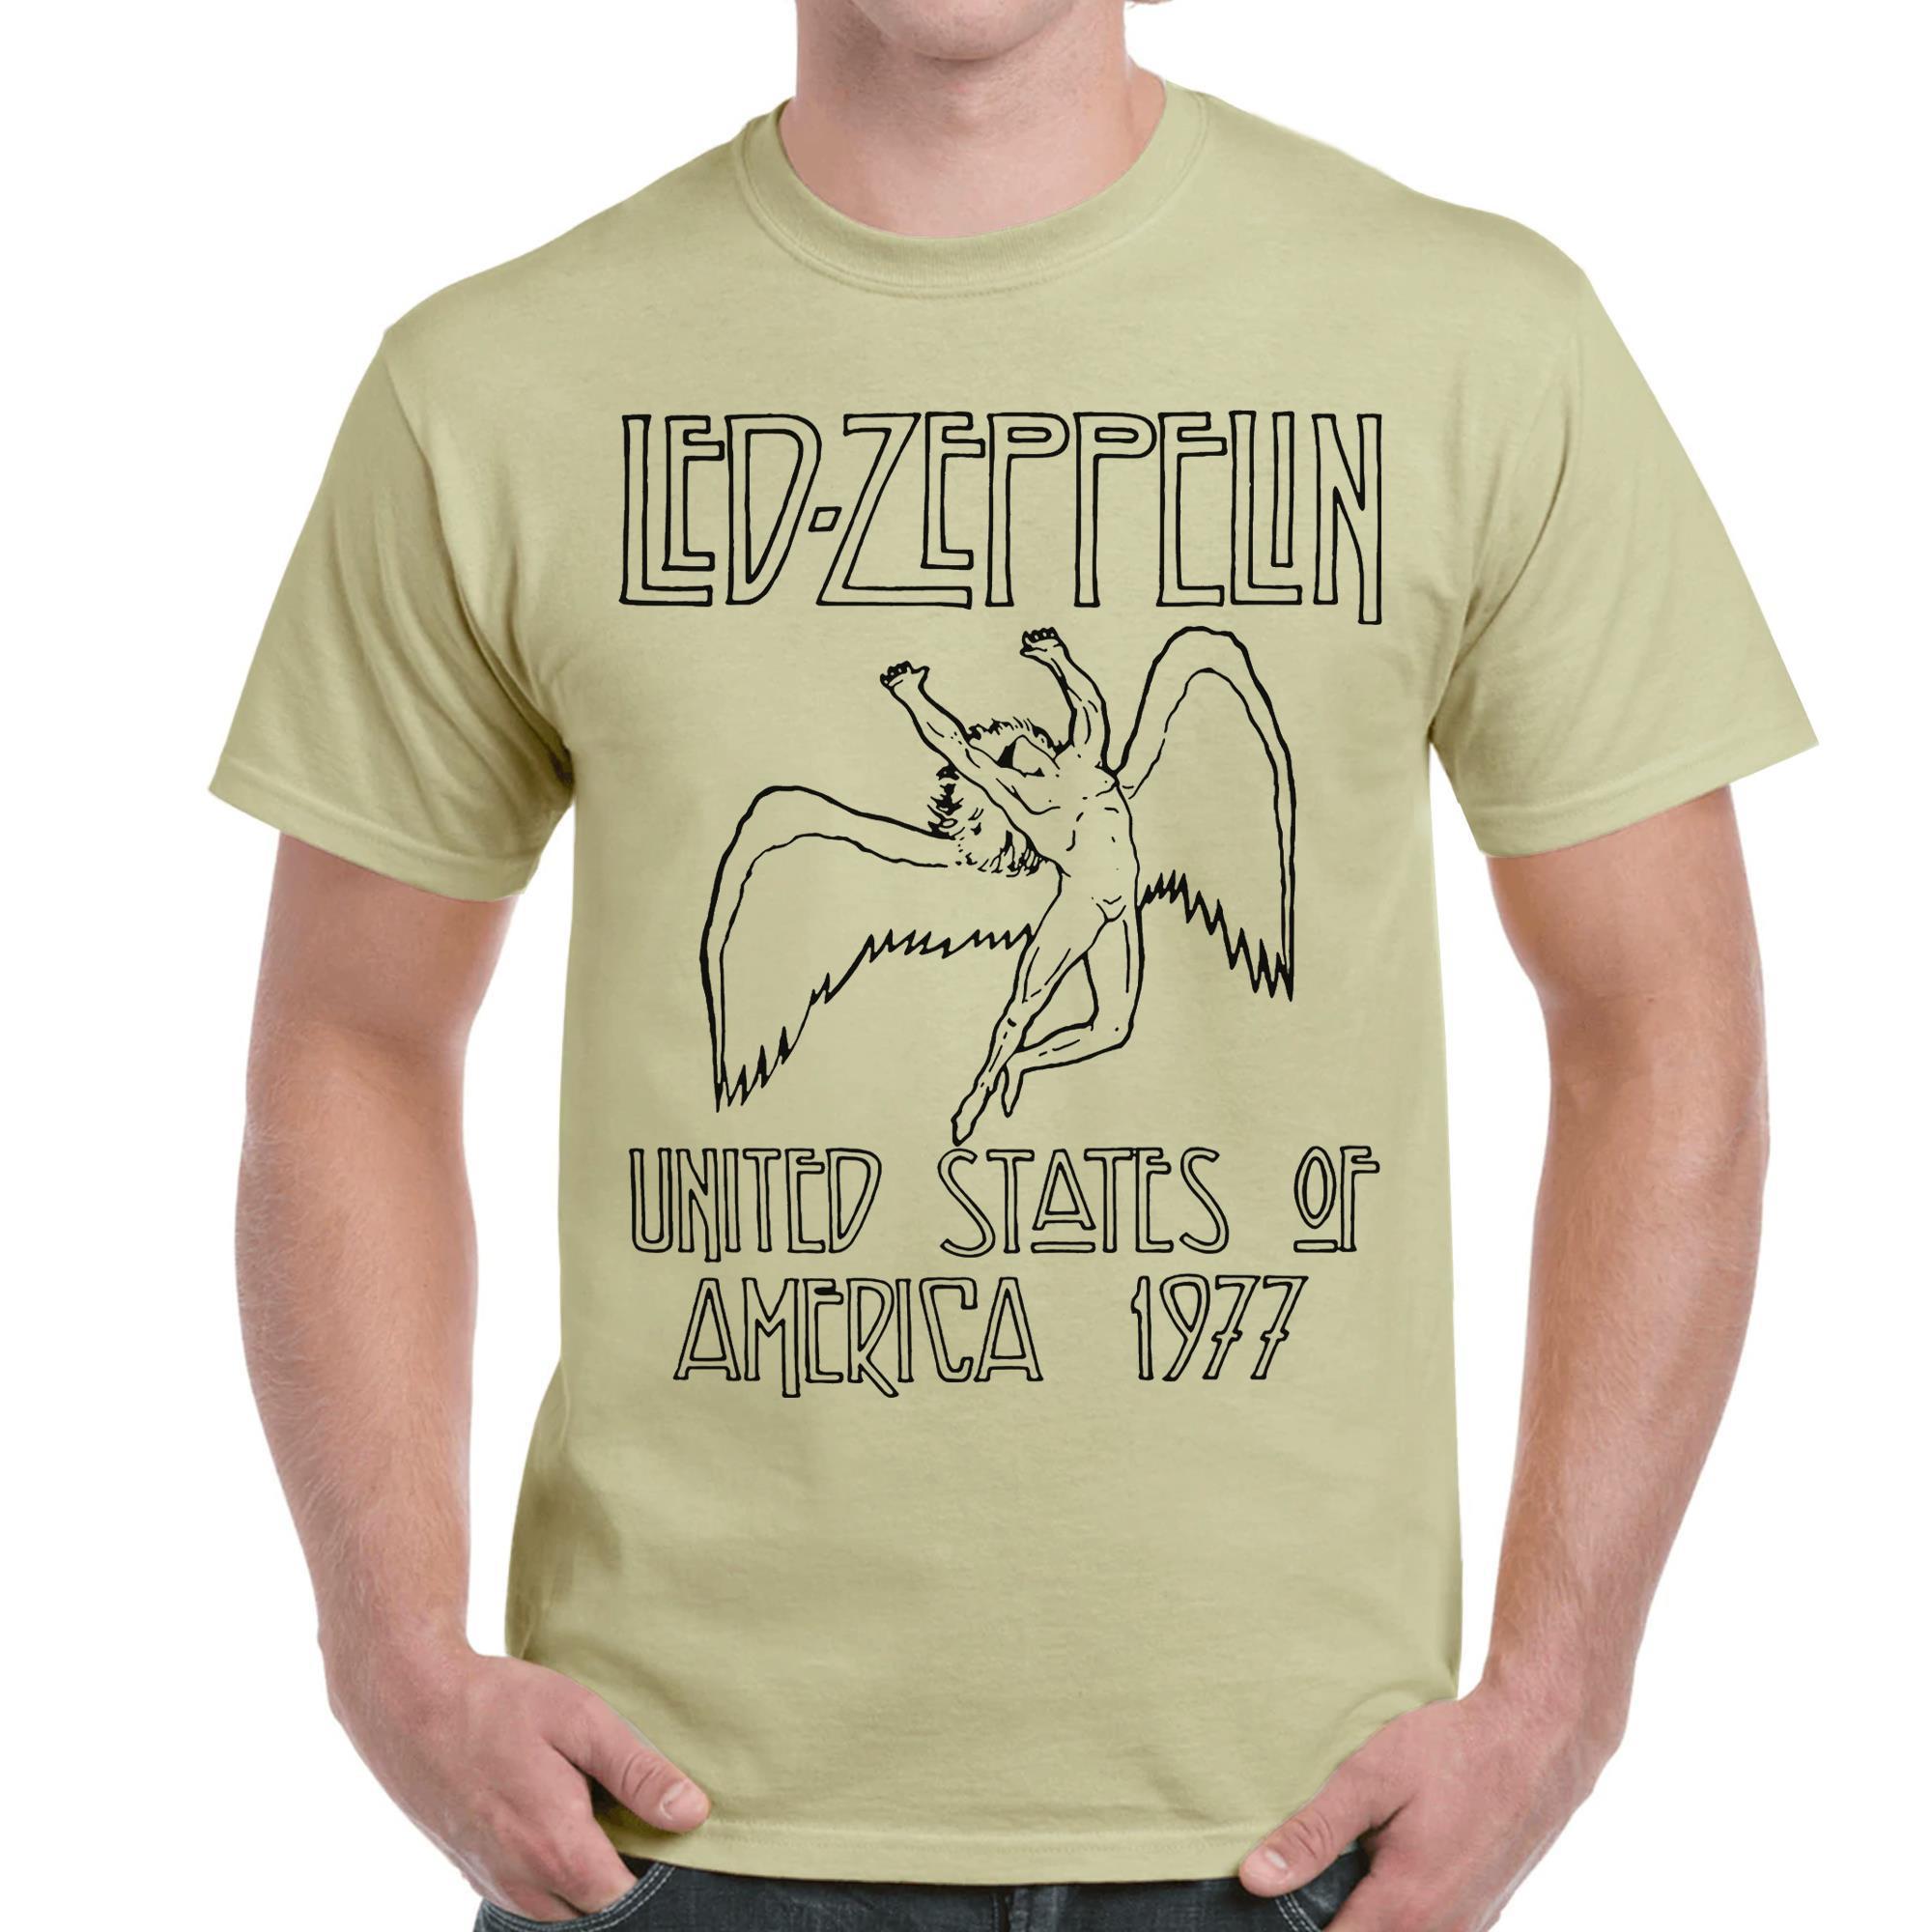 United States of America 1977 T-shirt